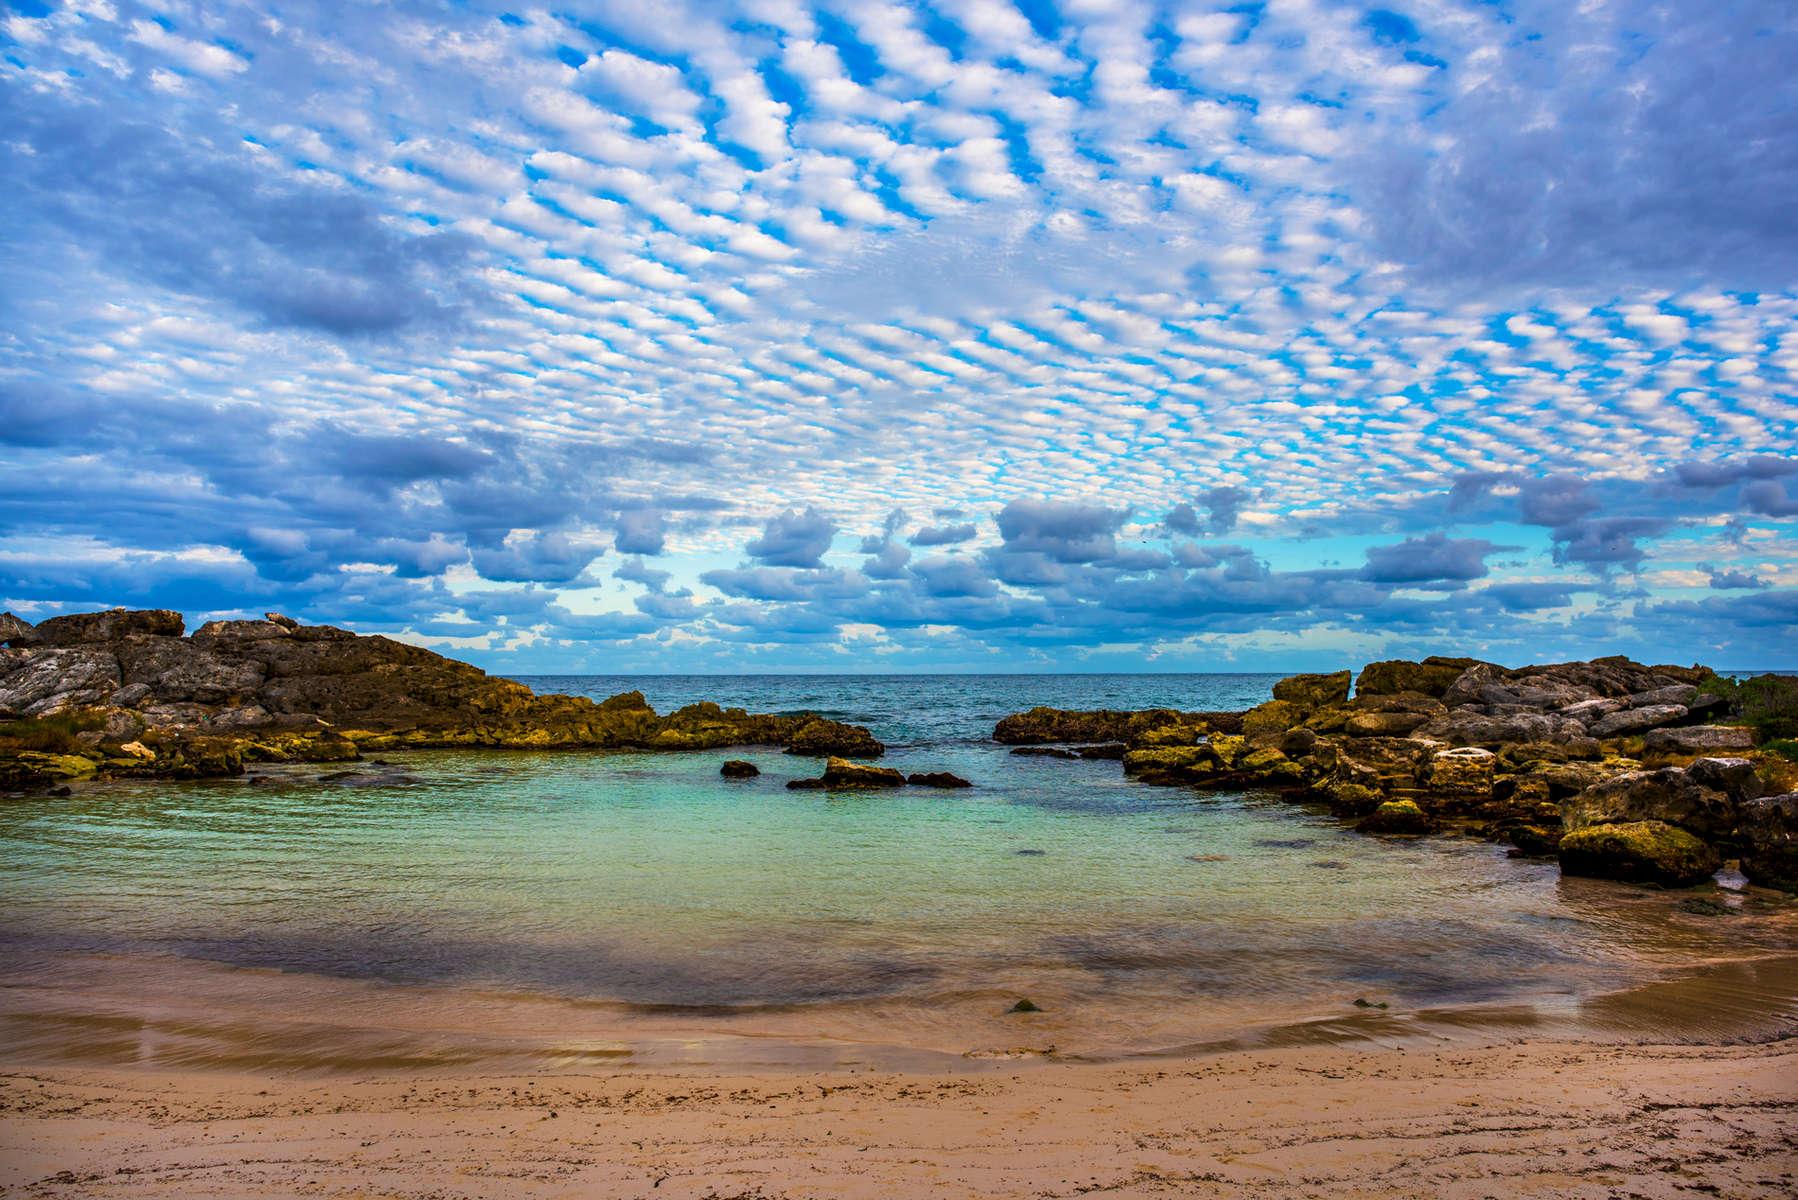 Sea, Sky & Rocks